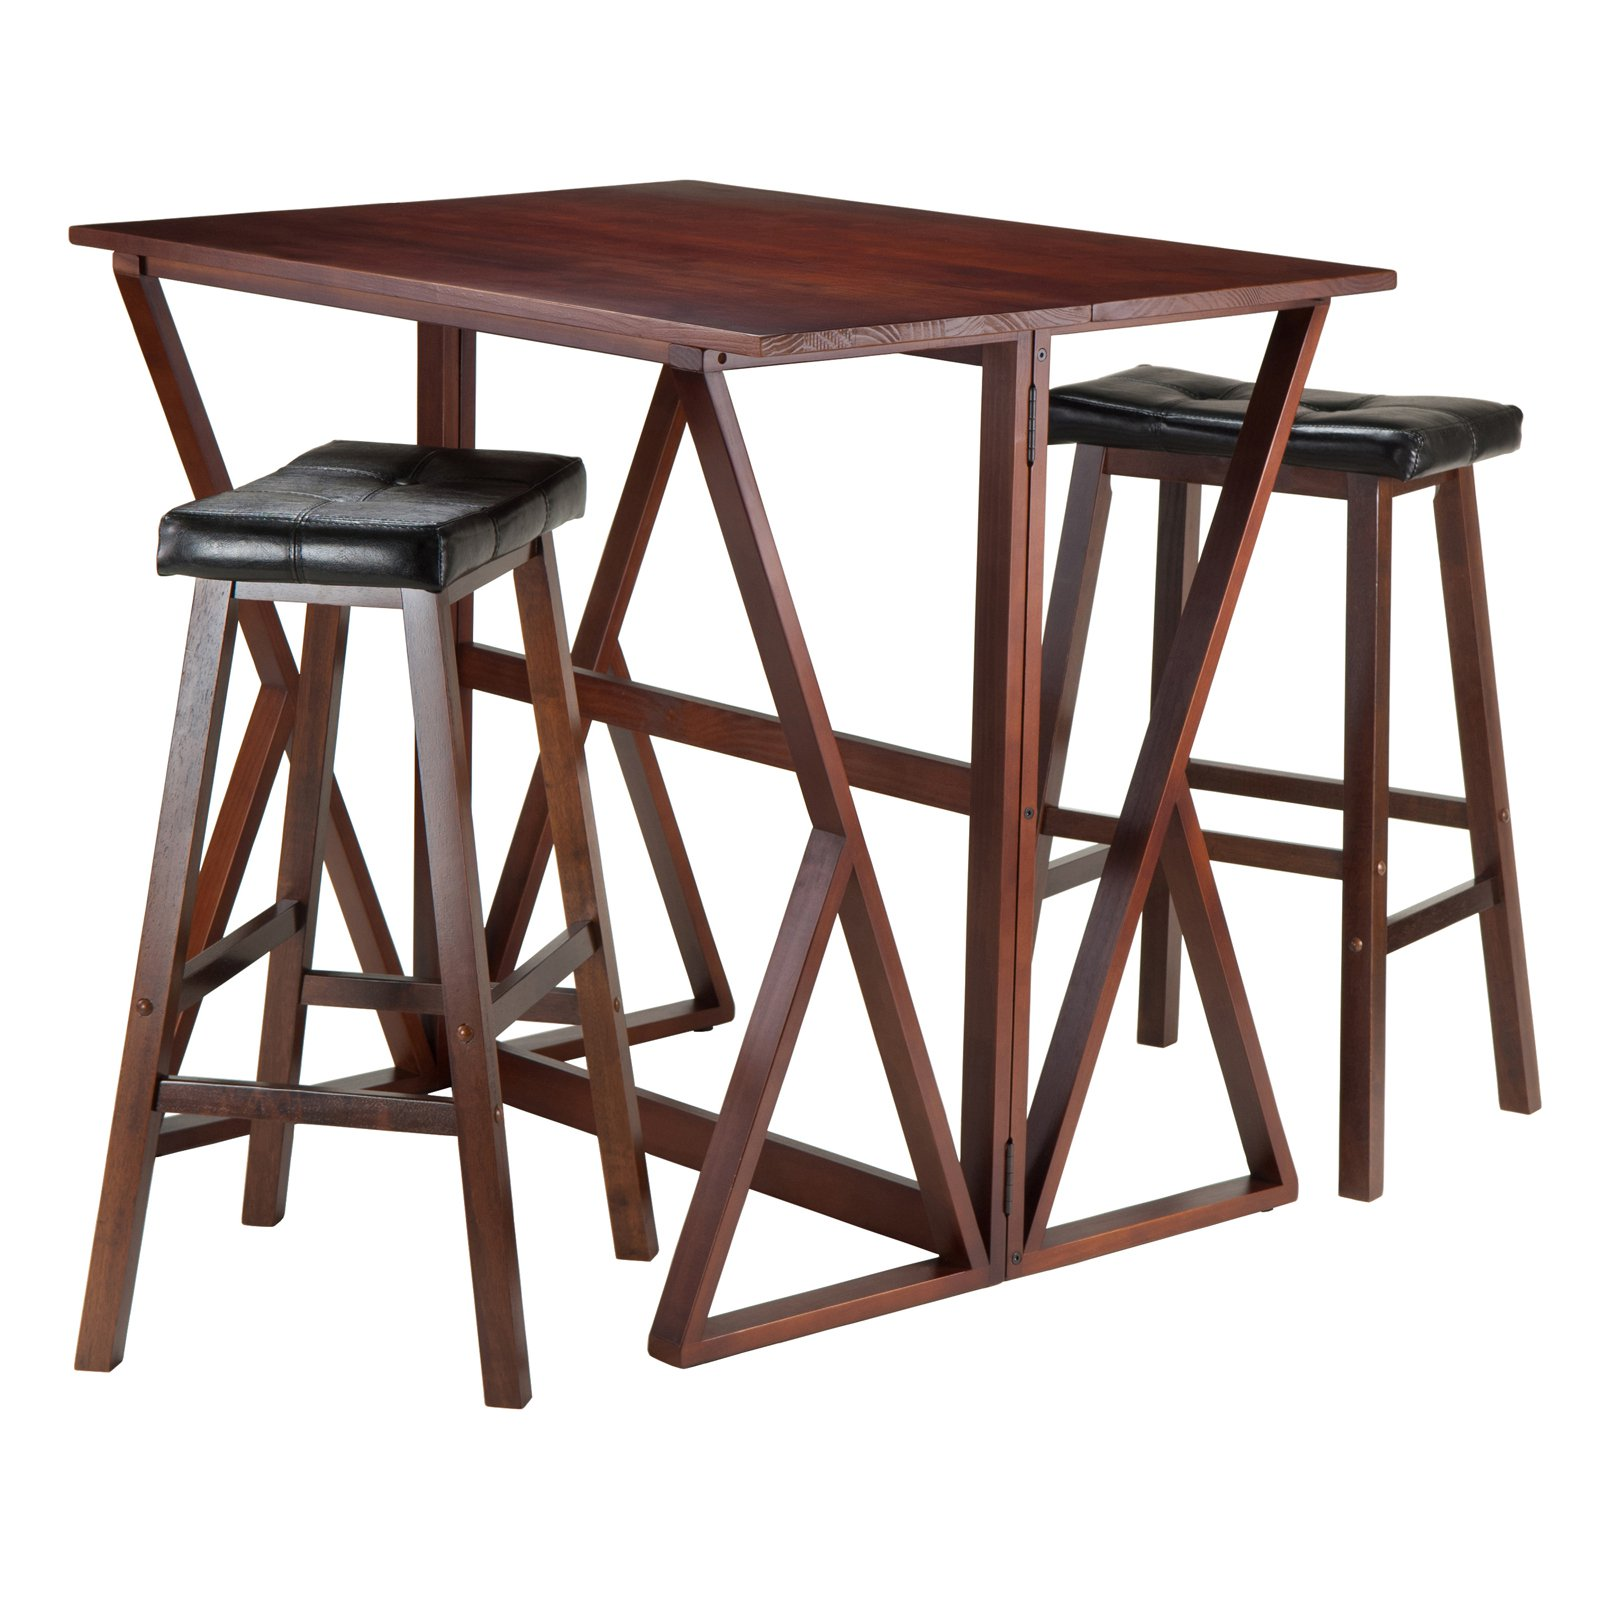 "Harrington 3-Pc Drop Leaf High Table, 2 -29"" Cushion Saddle Seat Stools"